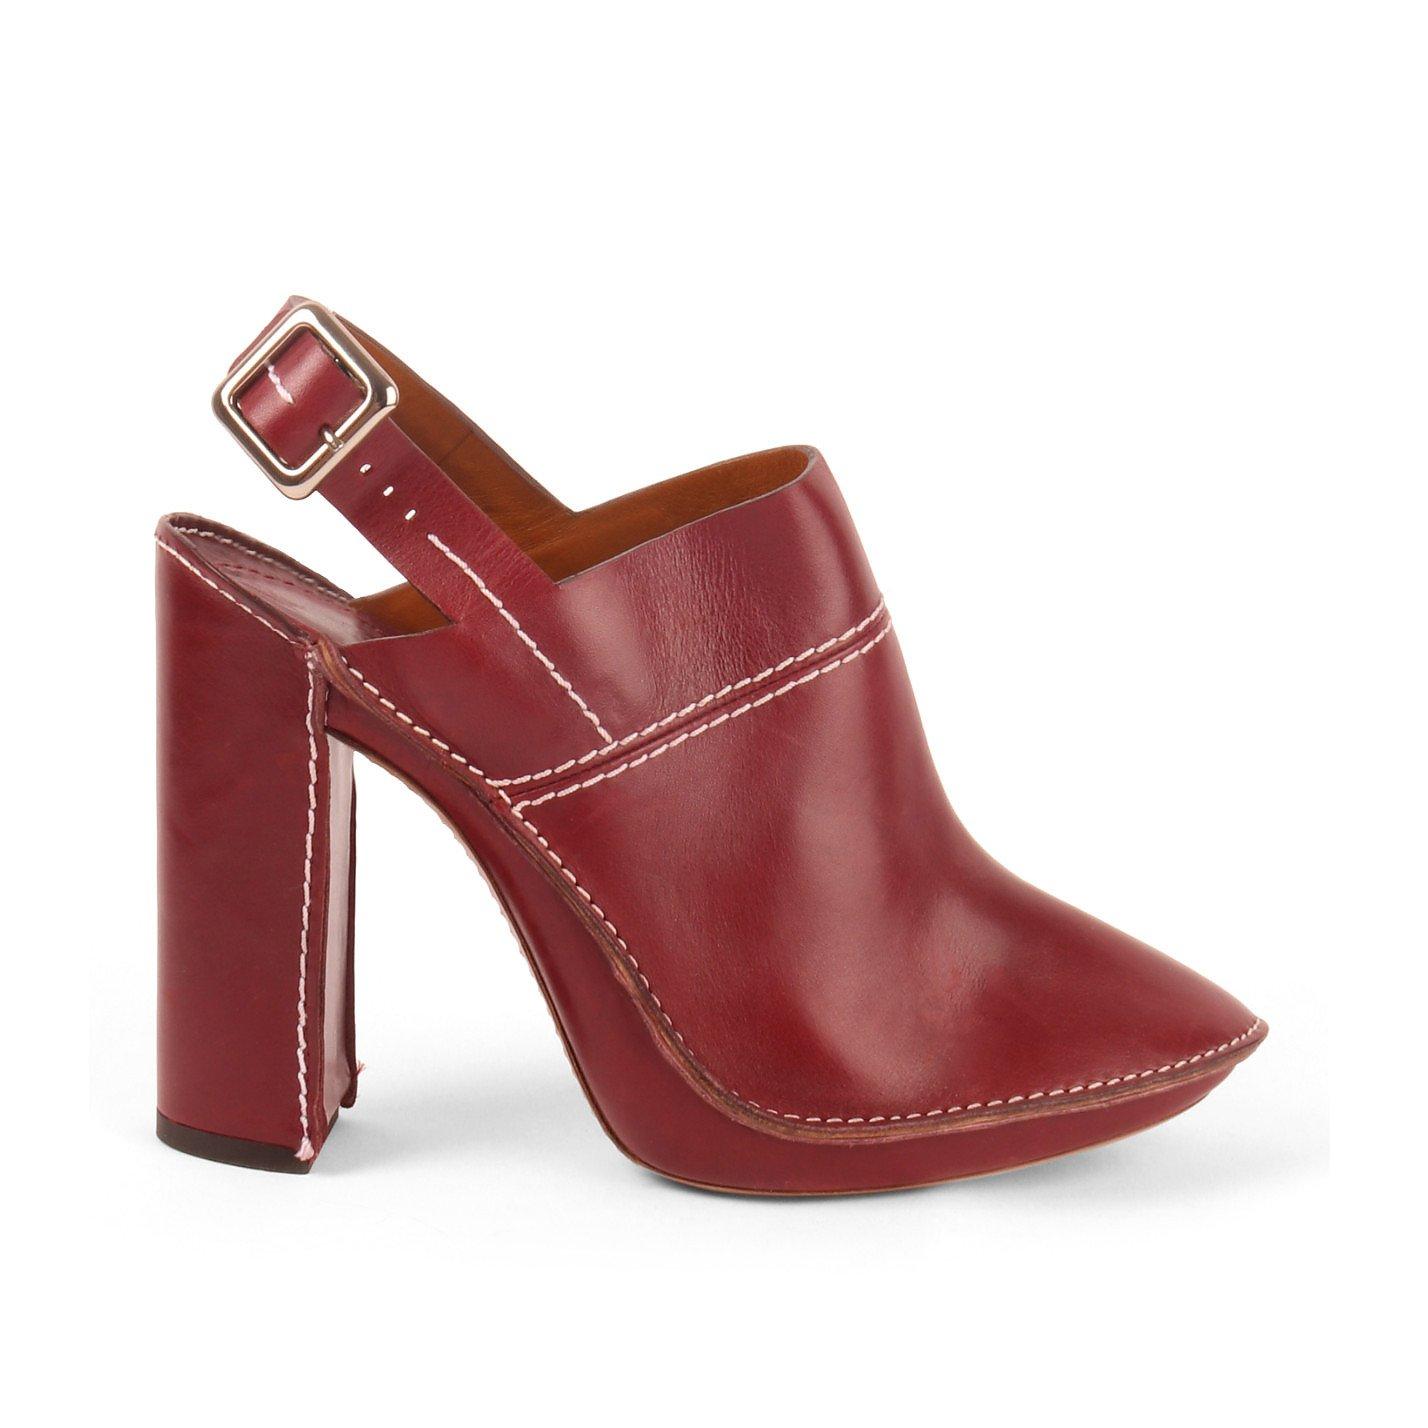 Chloé Gabrielle Leather Slingback Mules